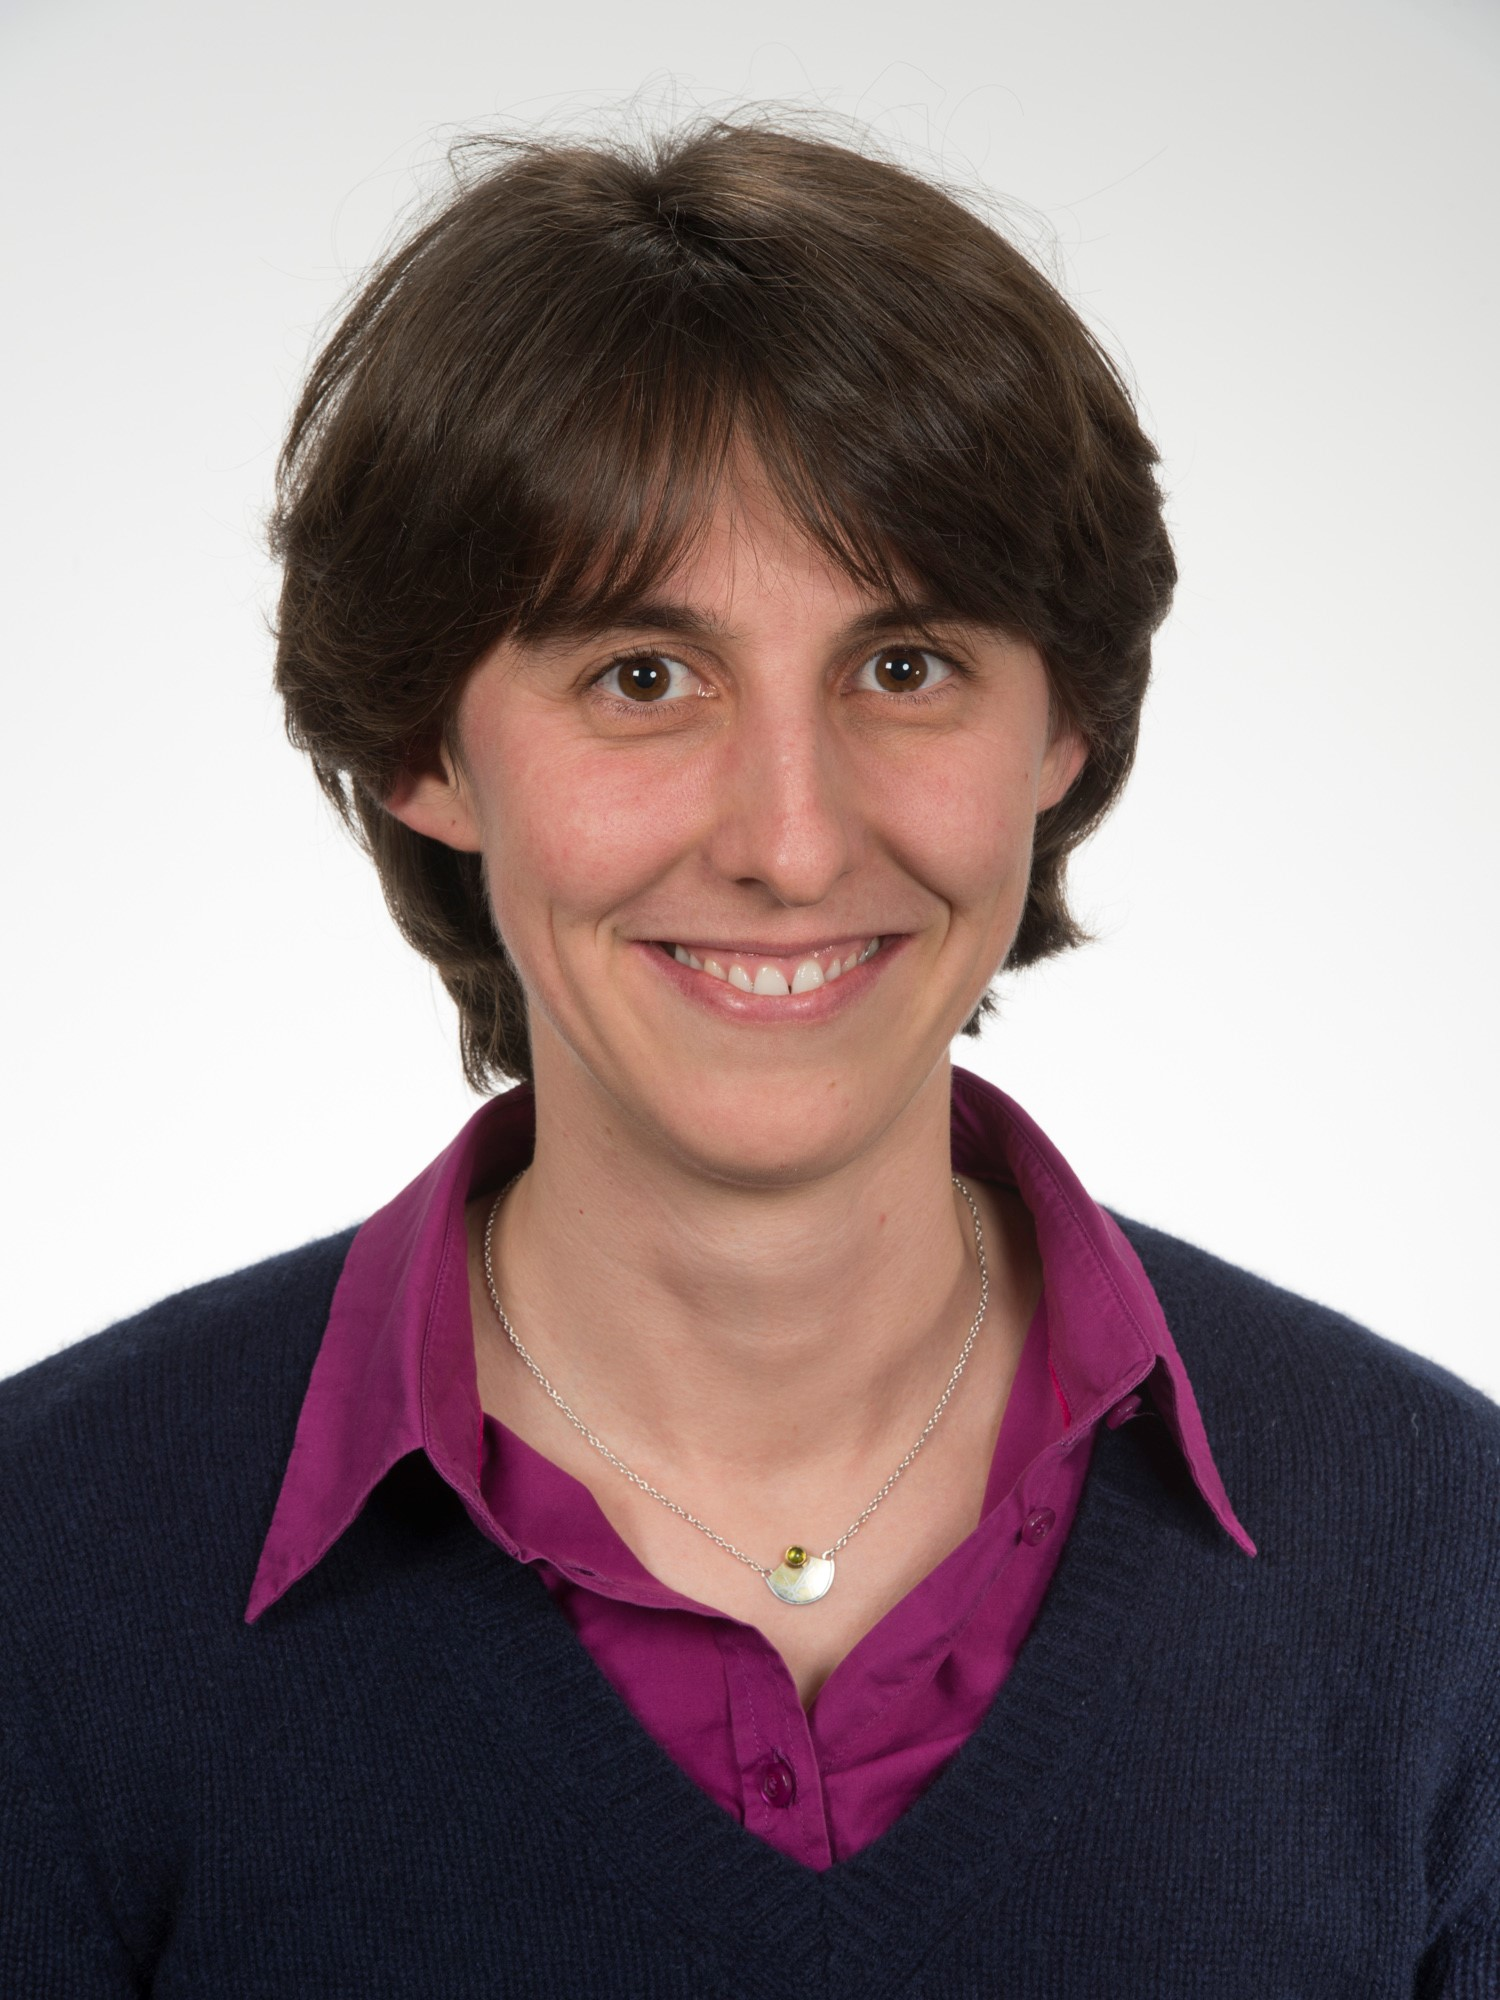 Dr. des. Lenka Fehrenbach